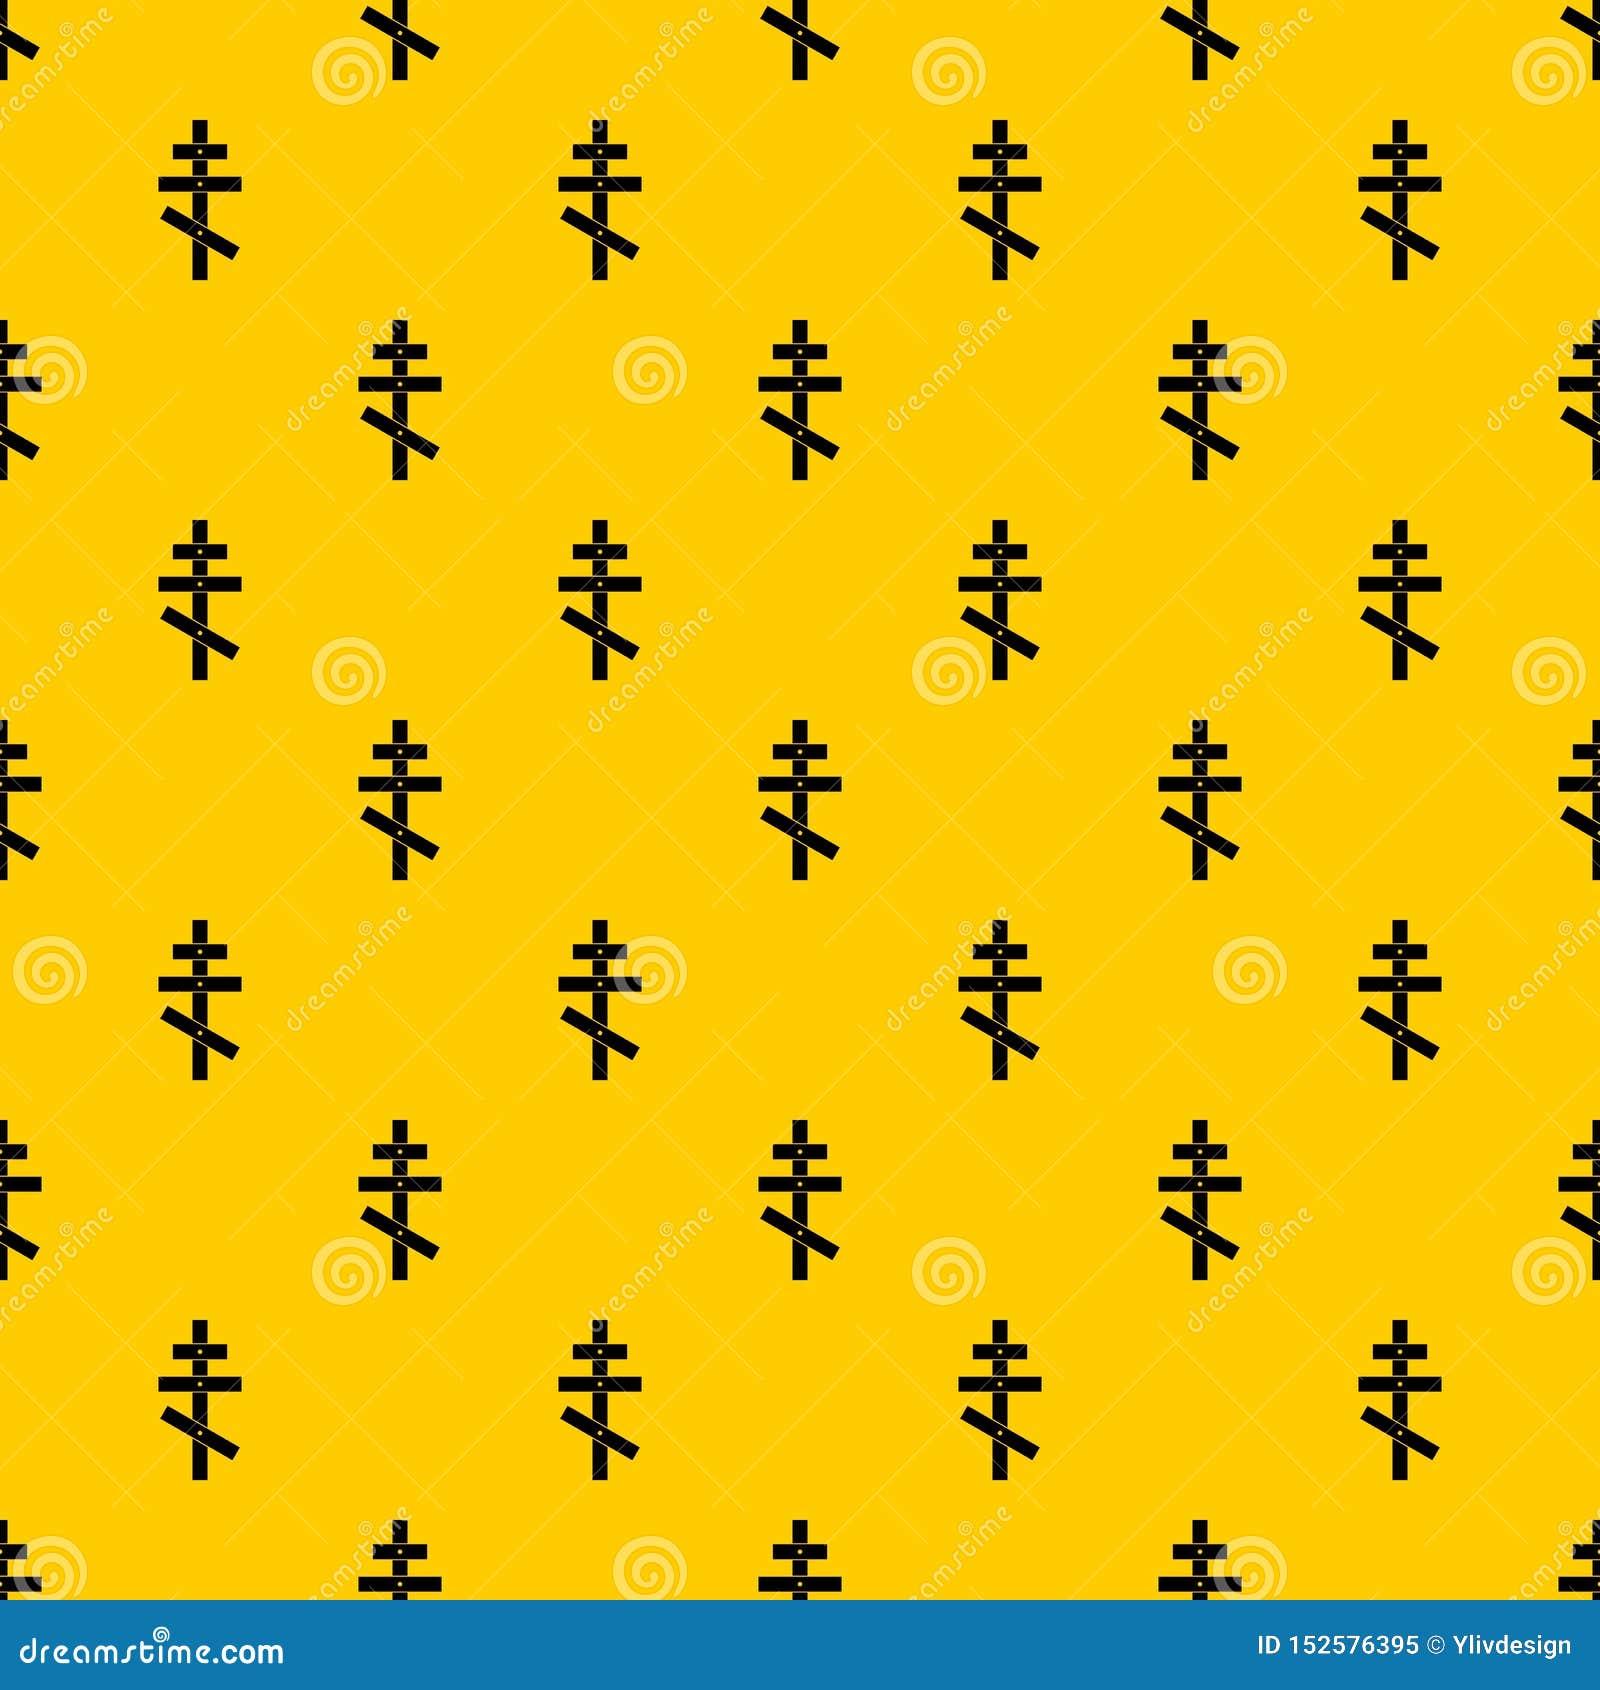 Orthodox cross pattern vector